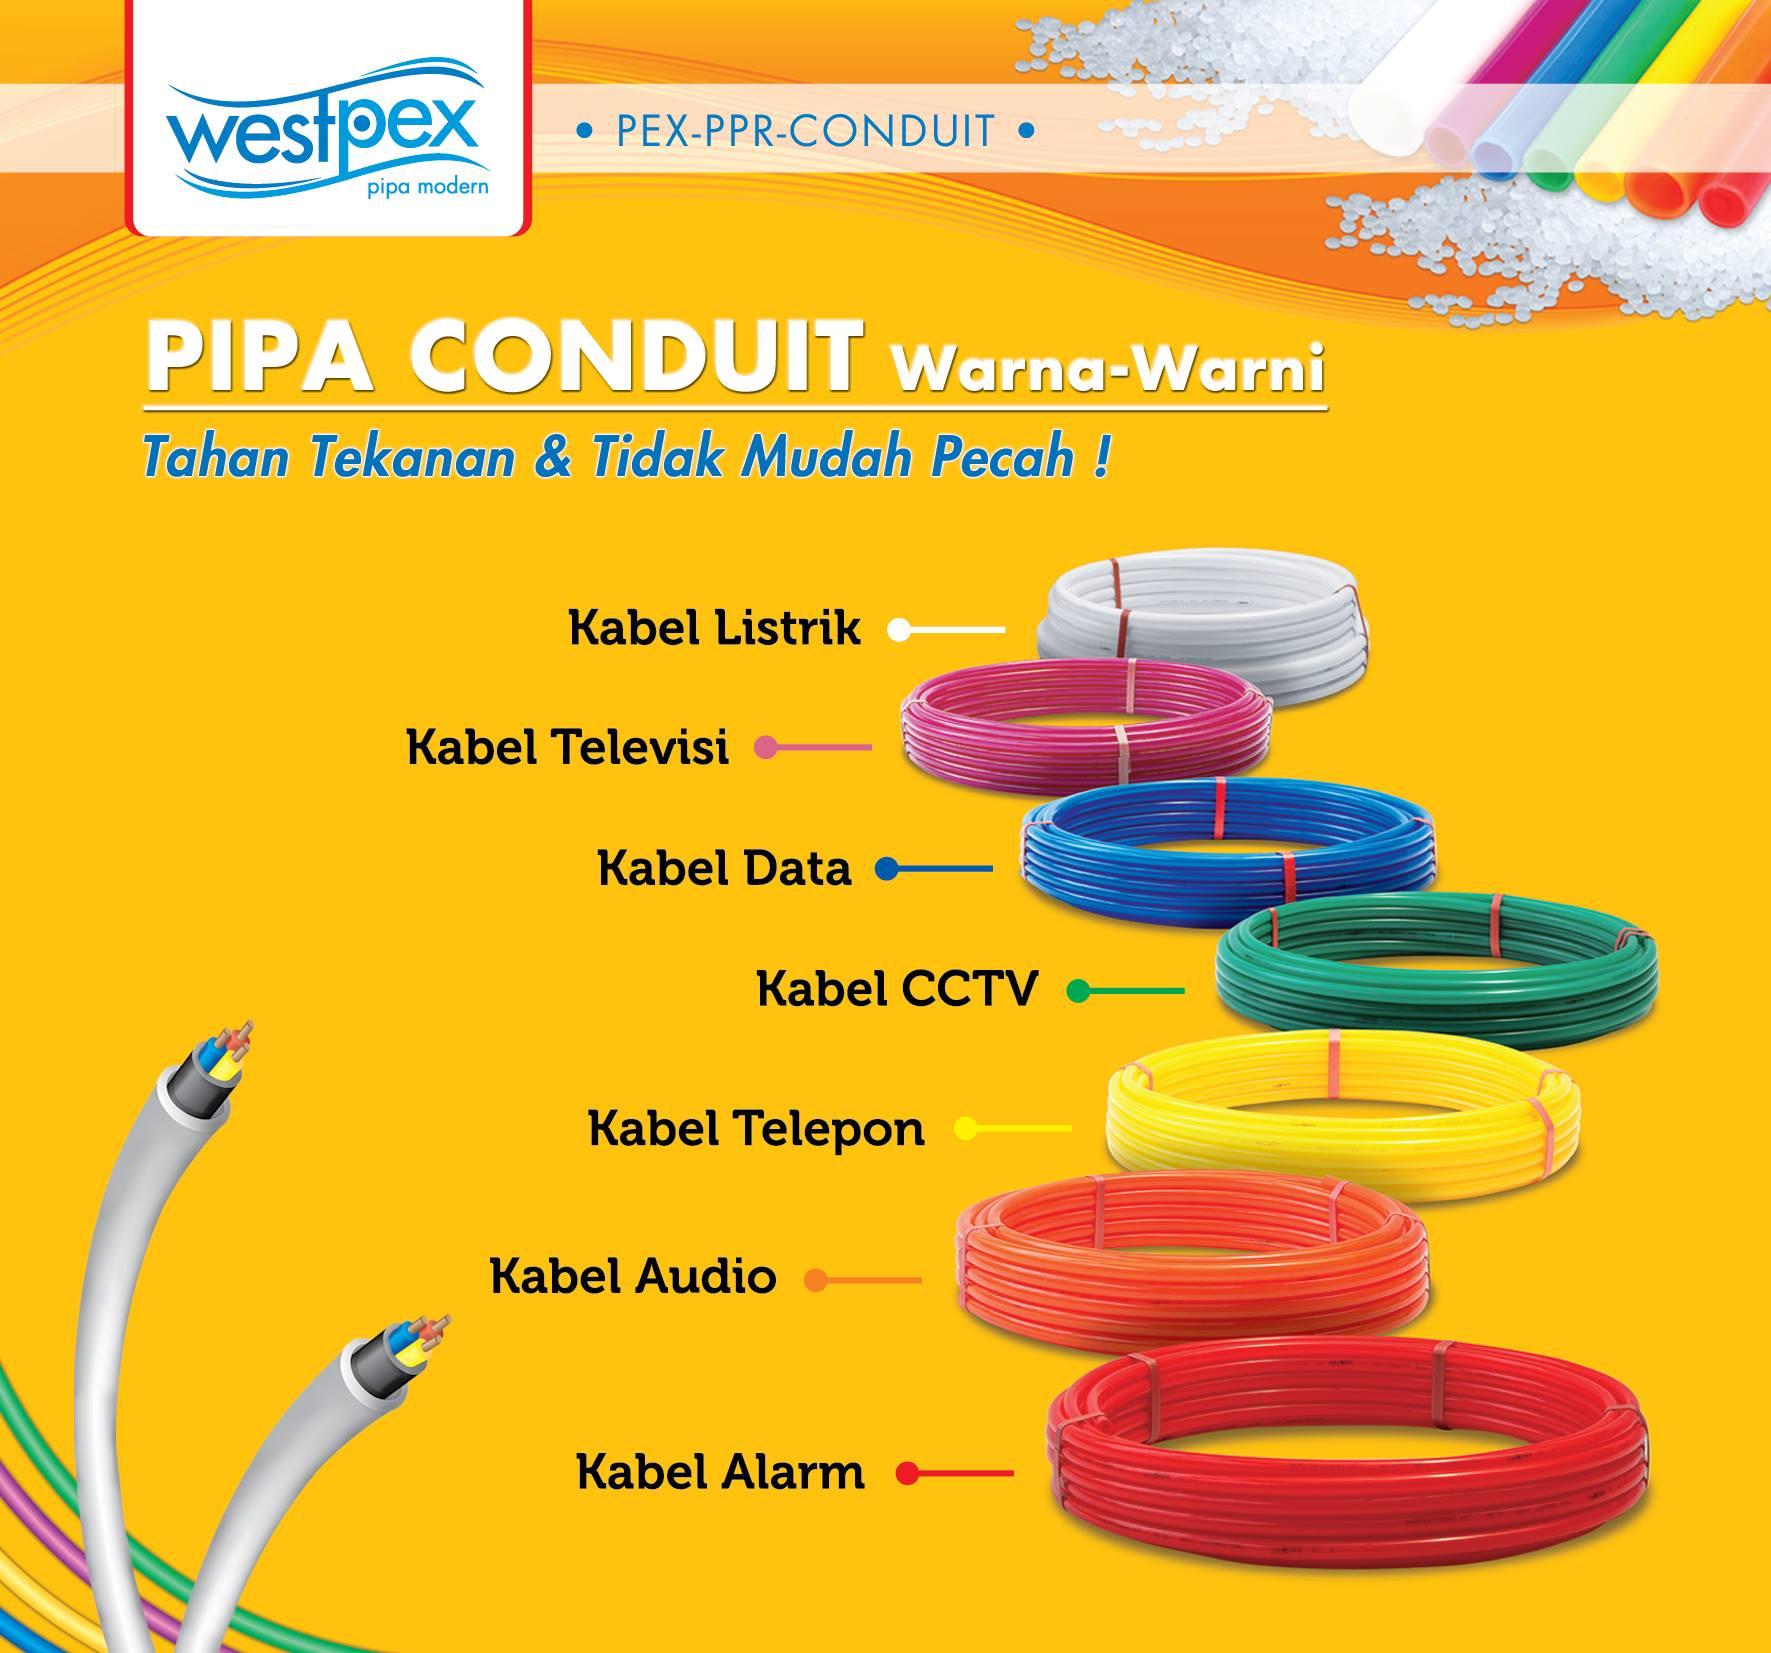 PIPA CONDUIT - WESTPEX